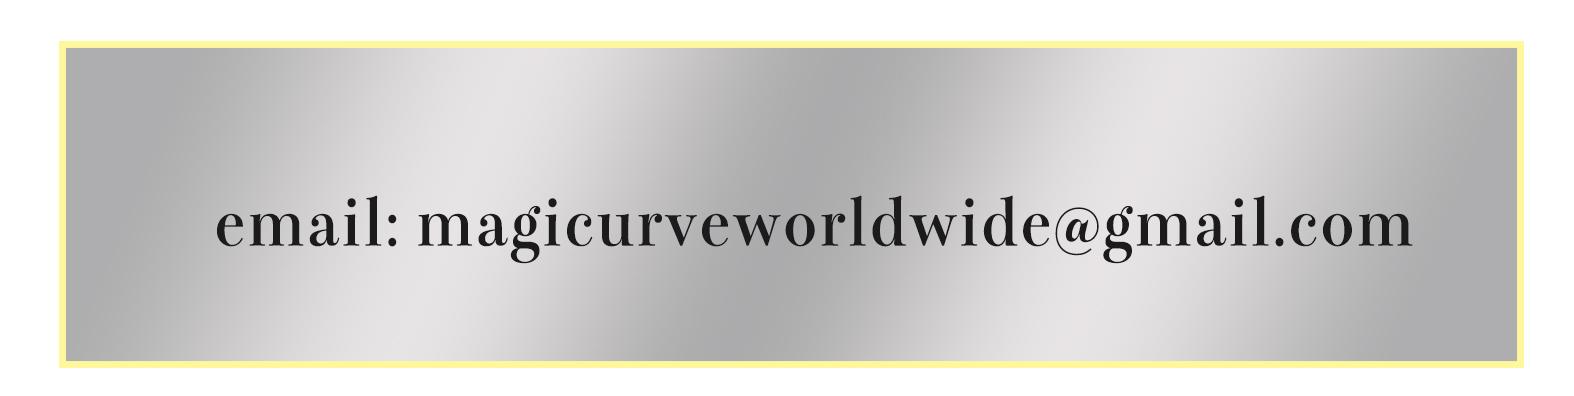 magicurveworldwide@gmail.com